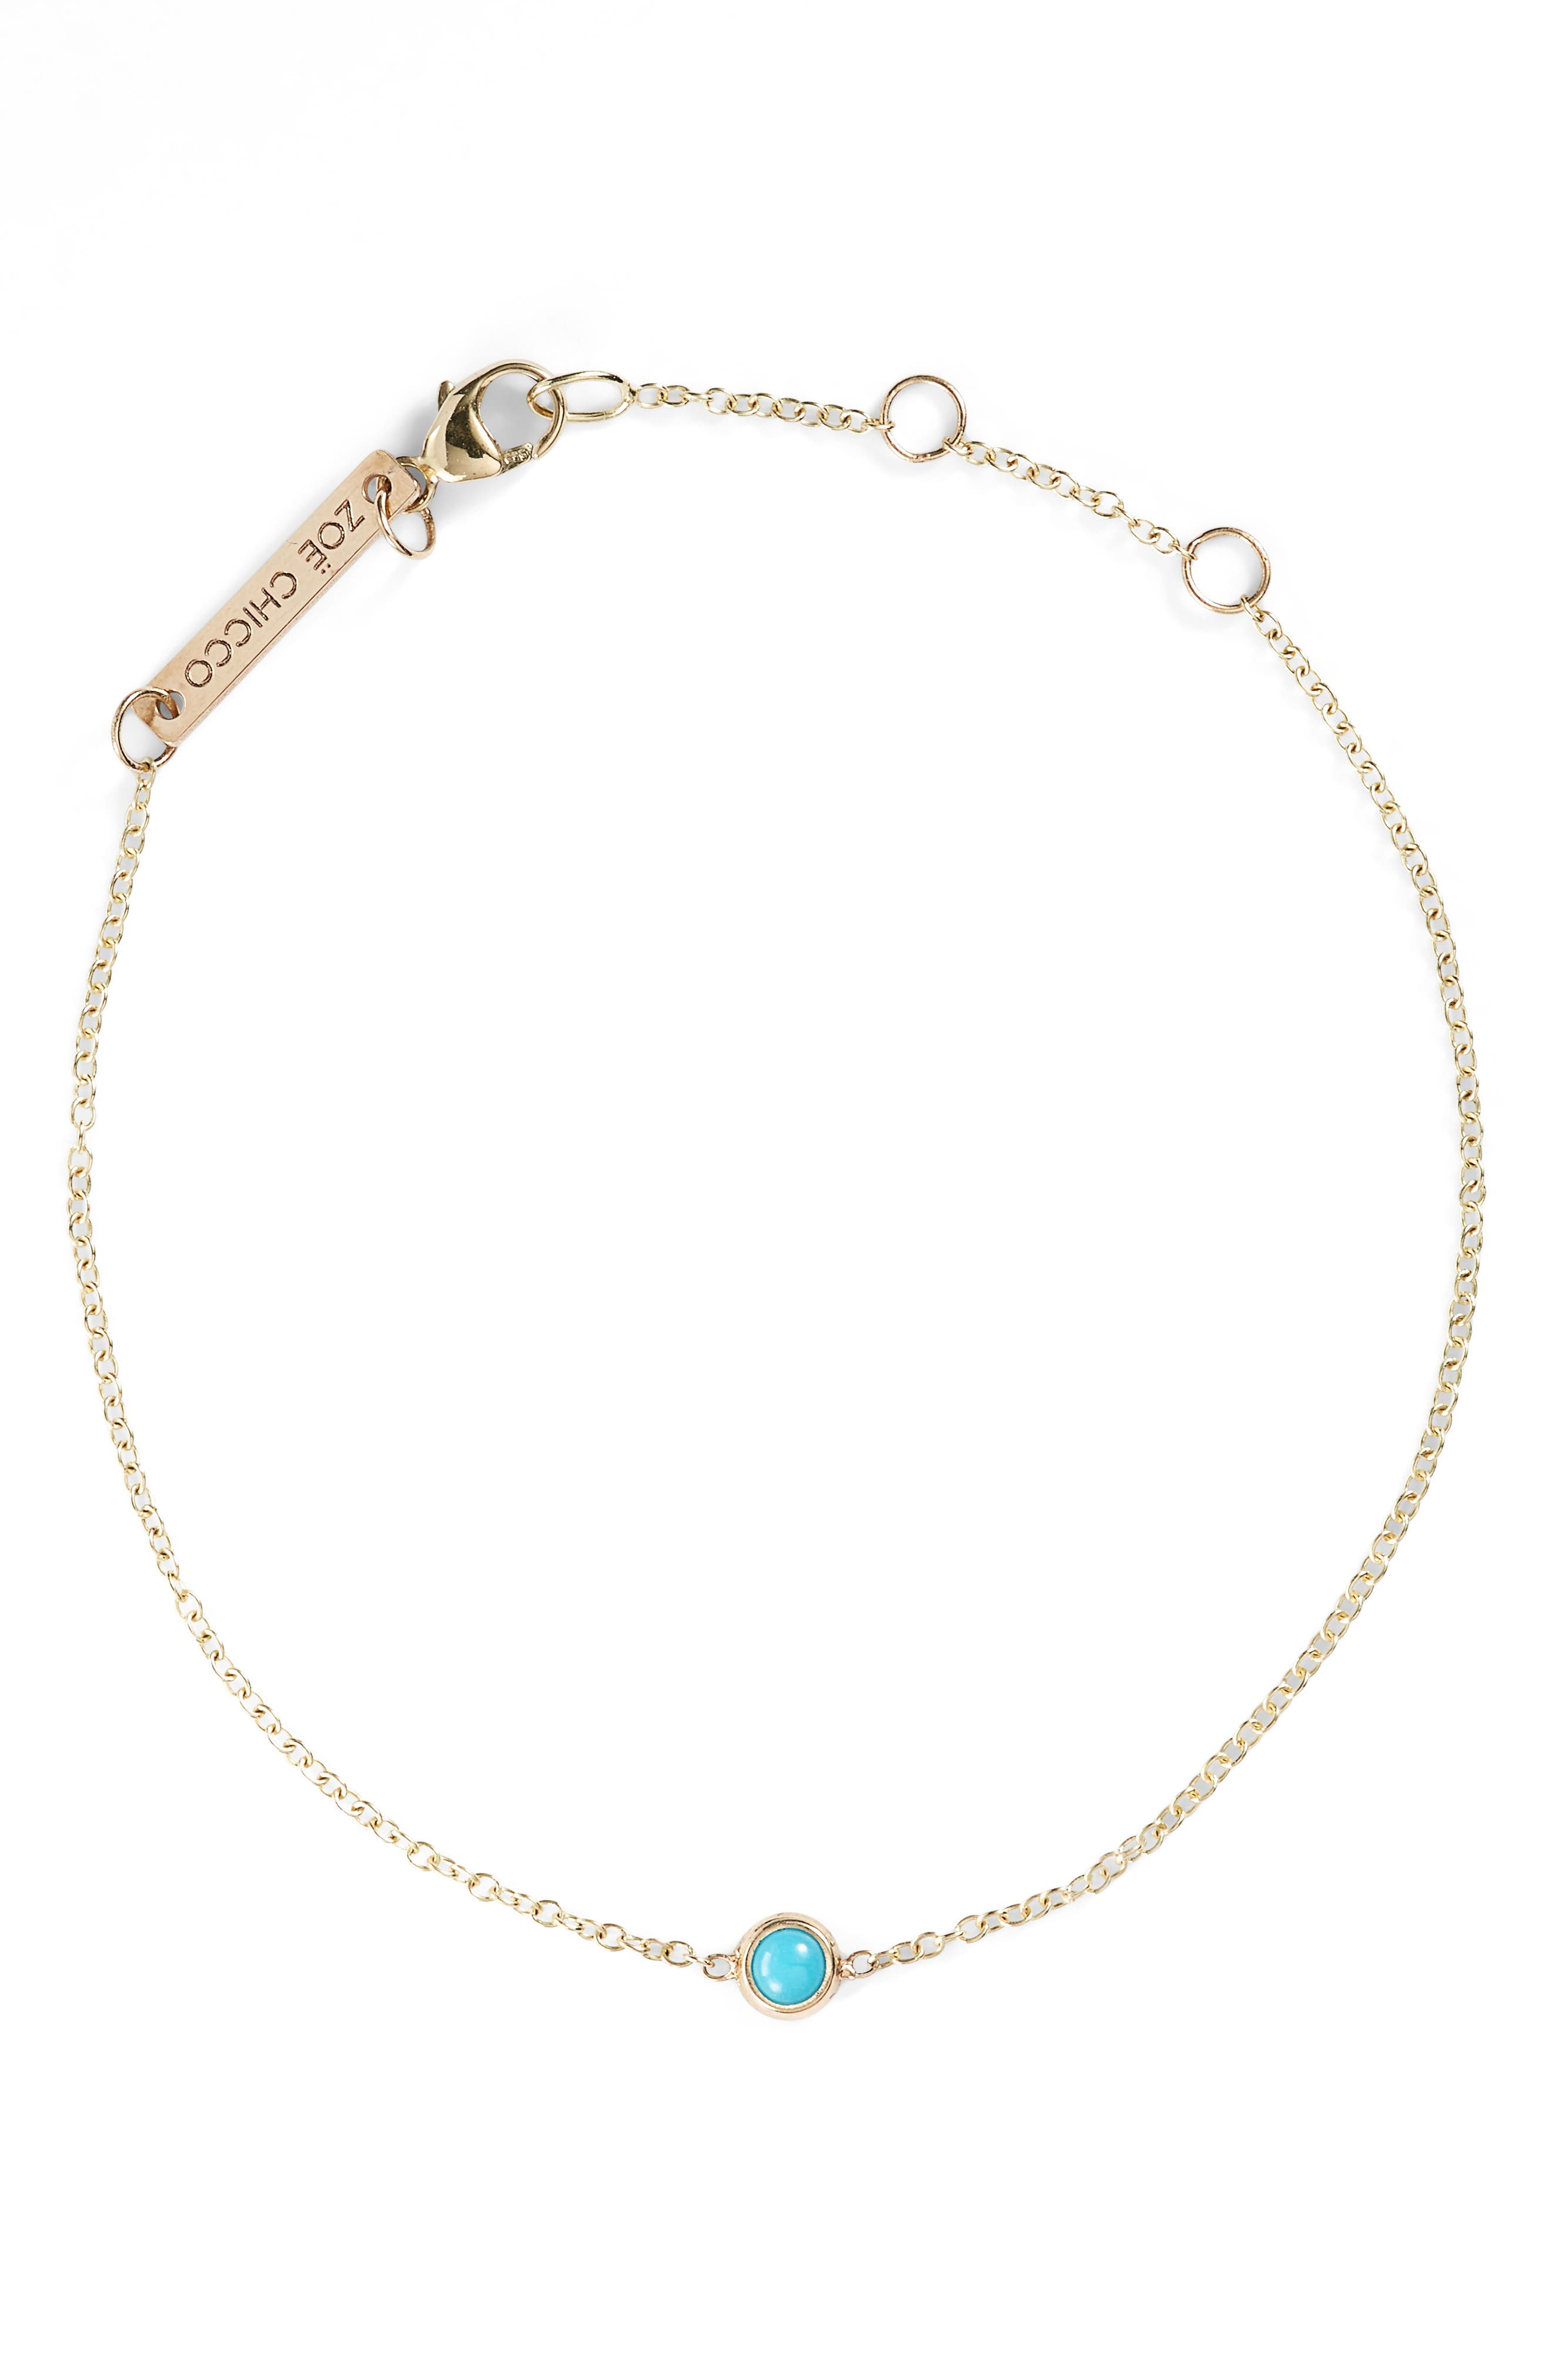 Main Image - Zoë Chicco Turquoise Bezel Line Bracelet